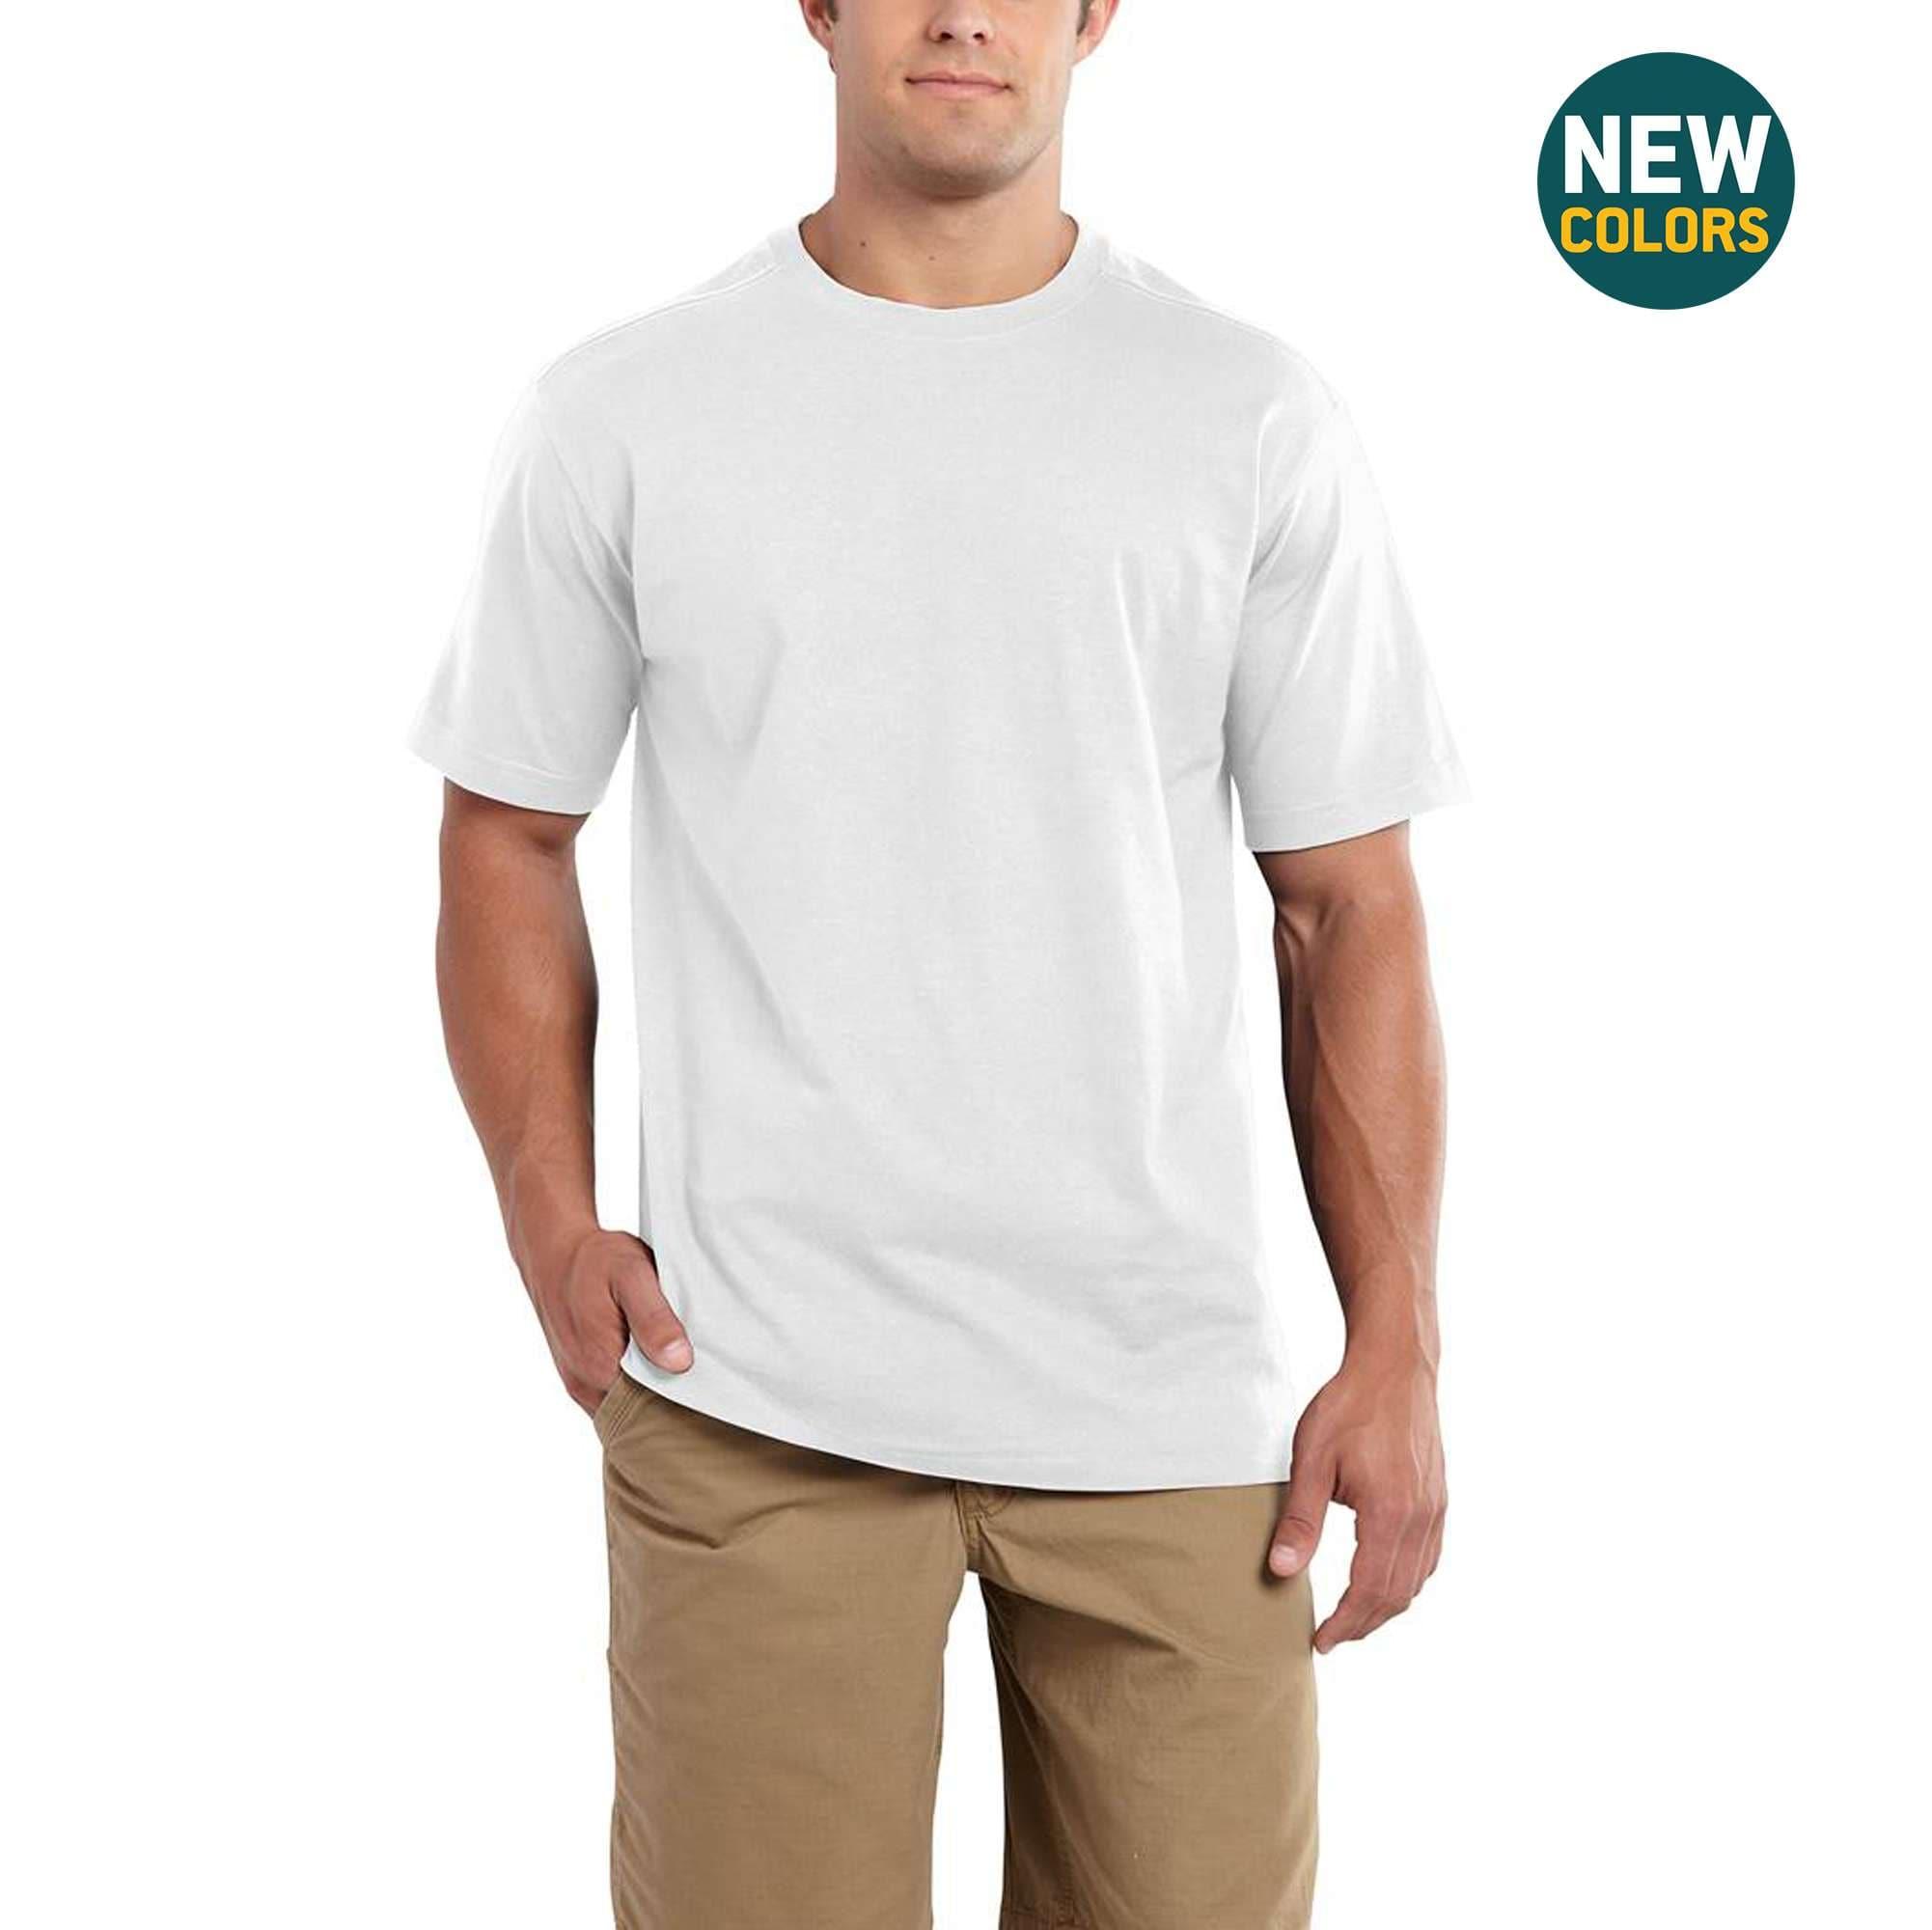 6b44a1cb1a26 Men s Maddock Non-Pocket Short-Sleeve T-Shirt 101124